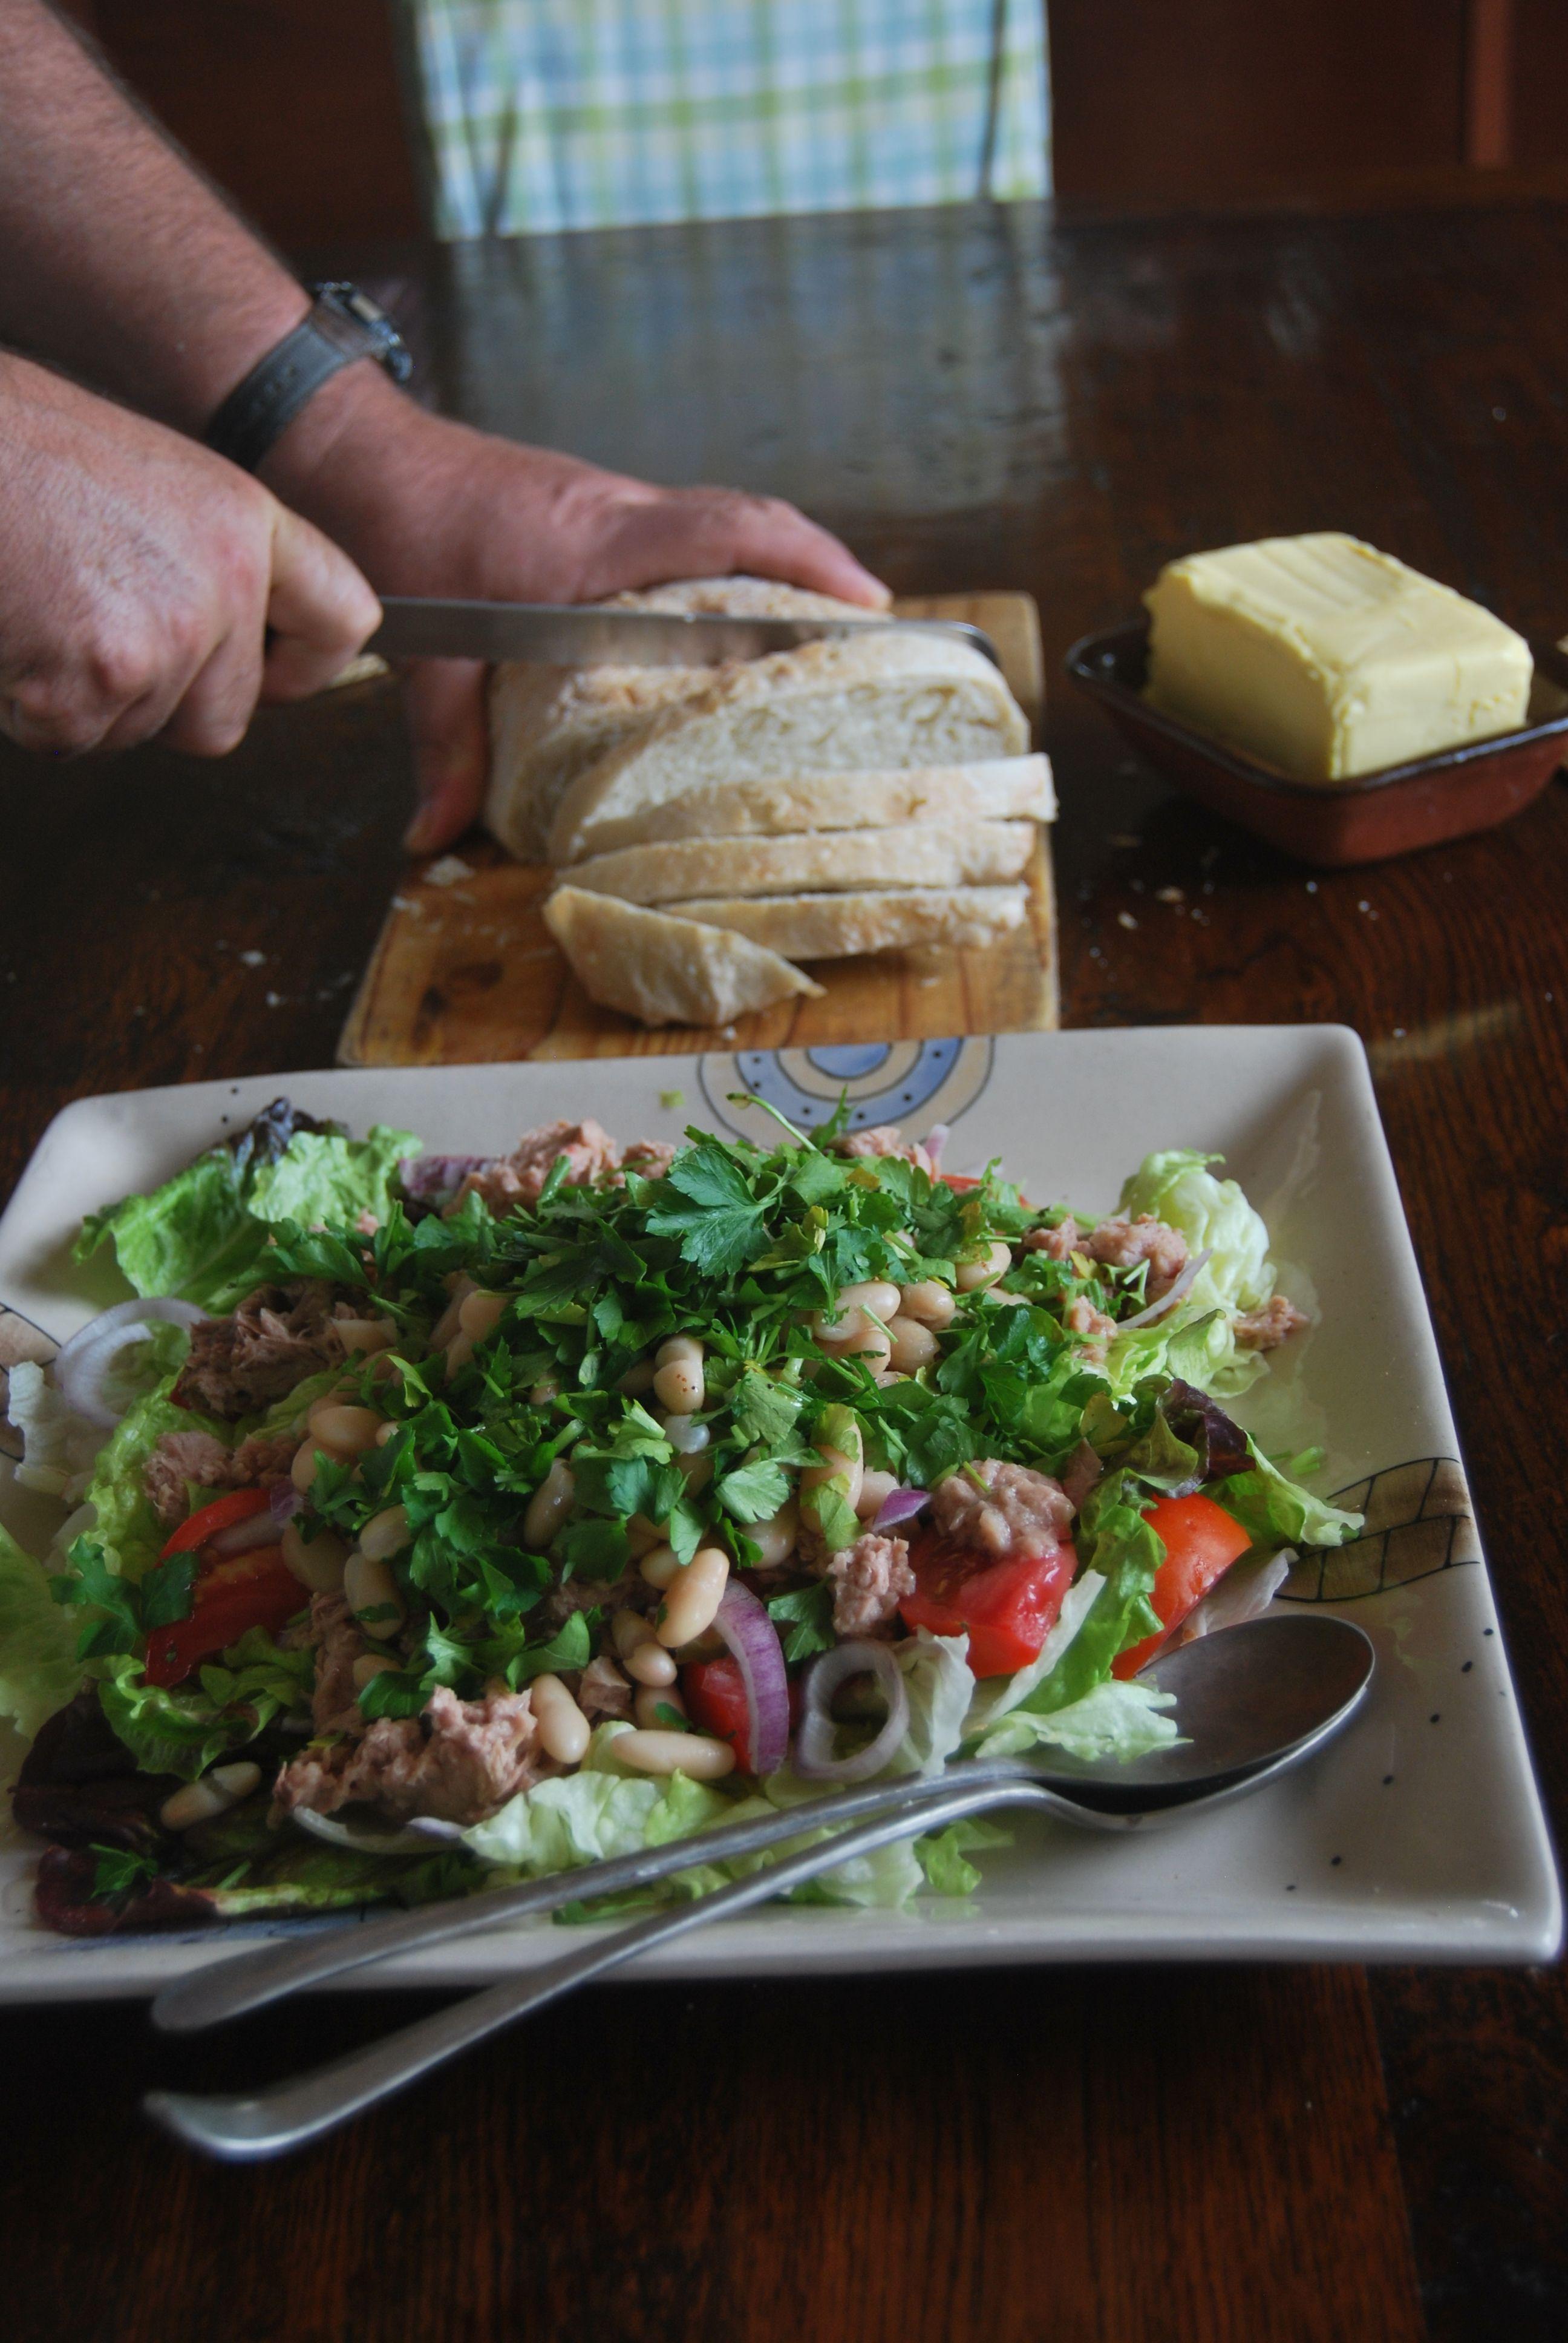 Italian white bean salad, local tomatoes & Family ciabatta